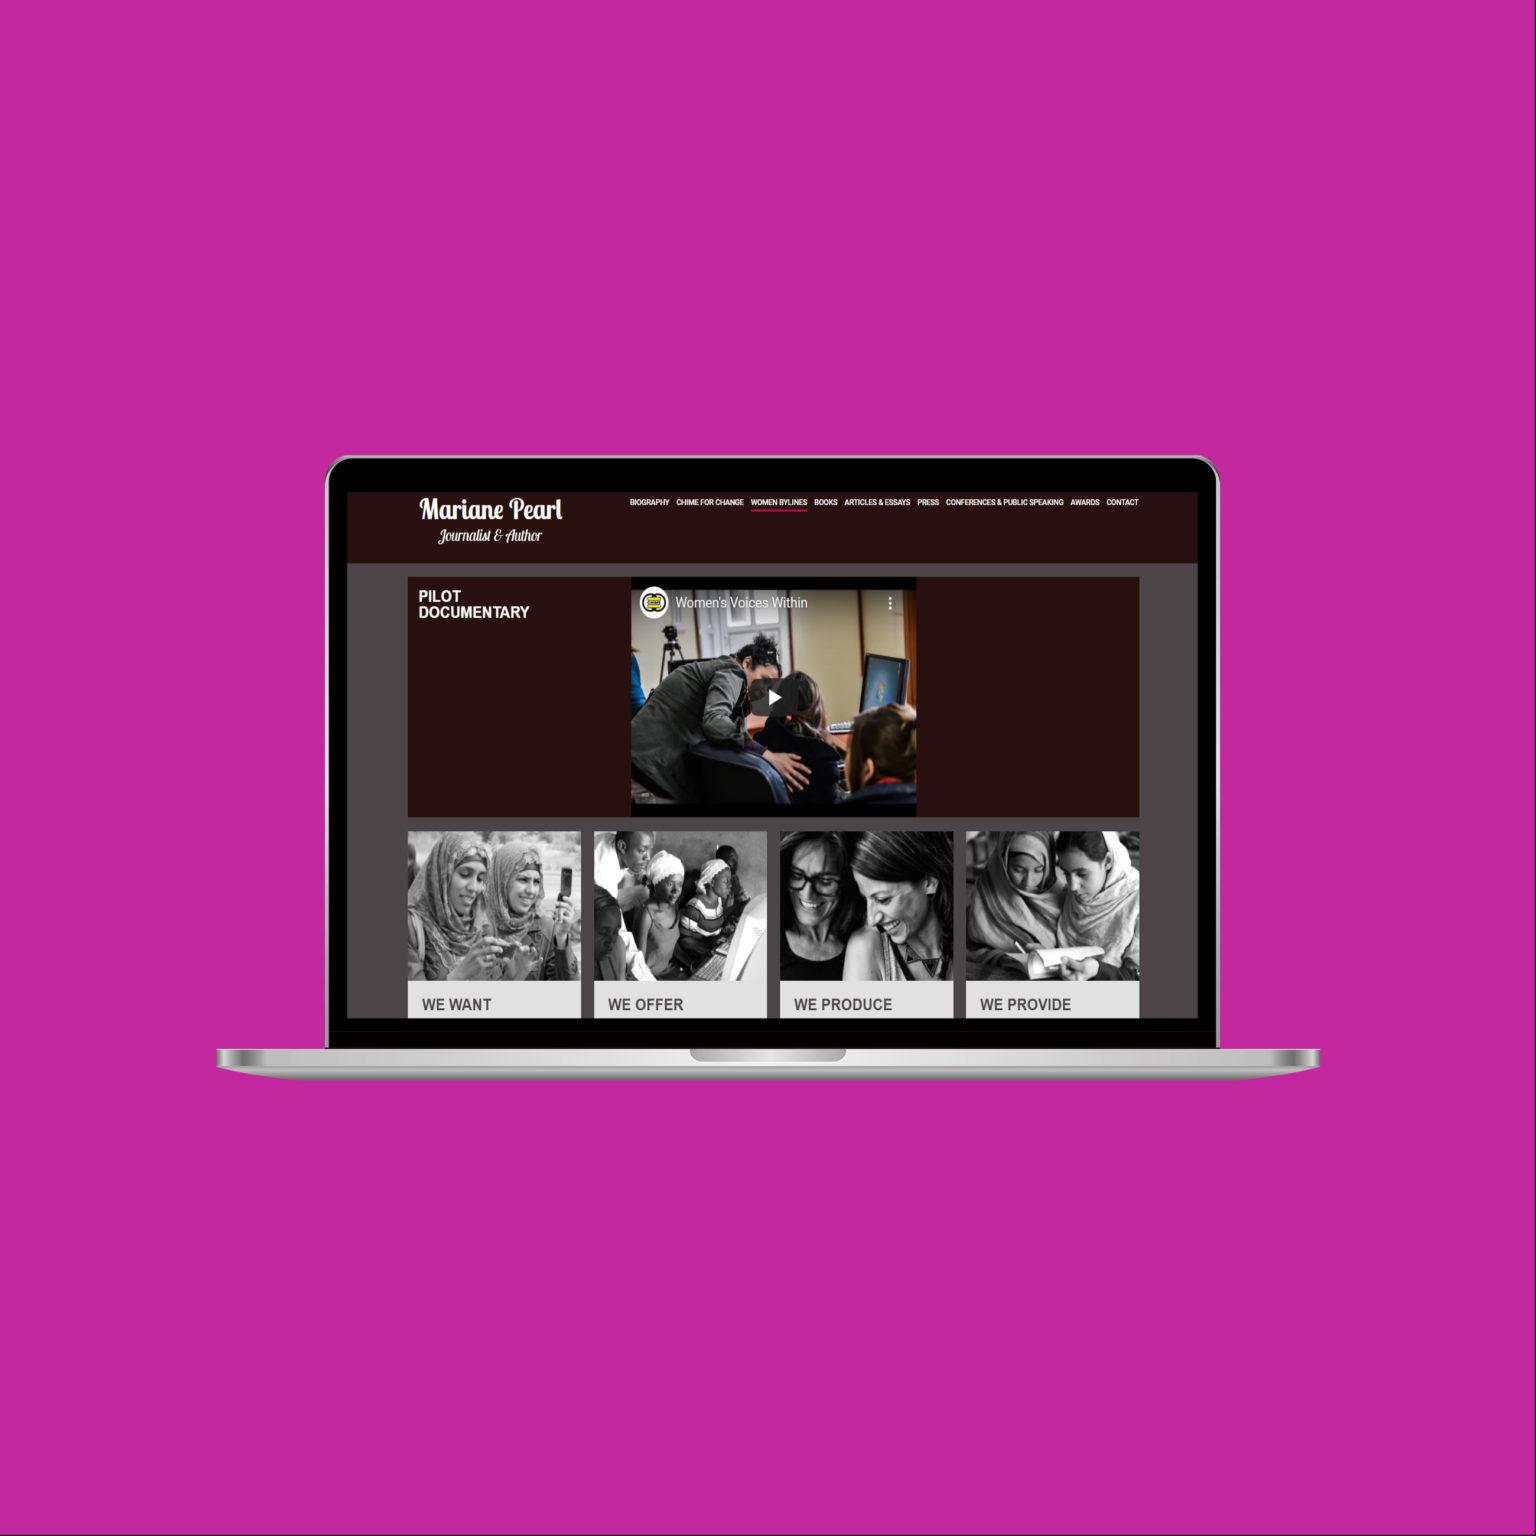 Miko Digital Agence web à Liège - Mariane Pearl